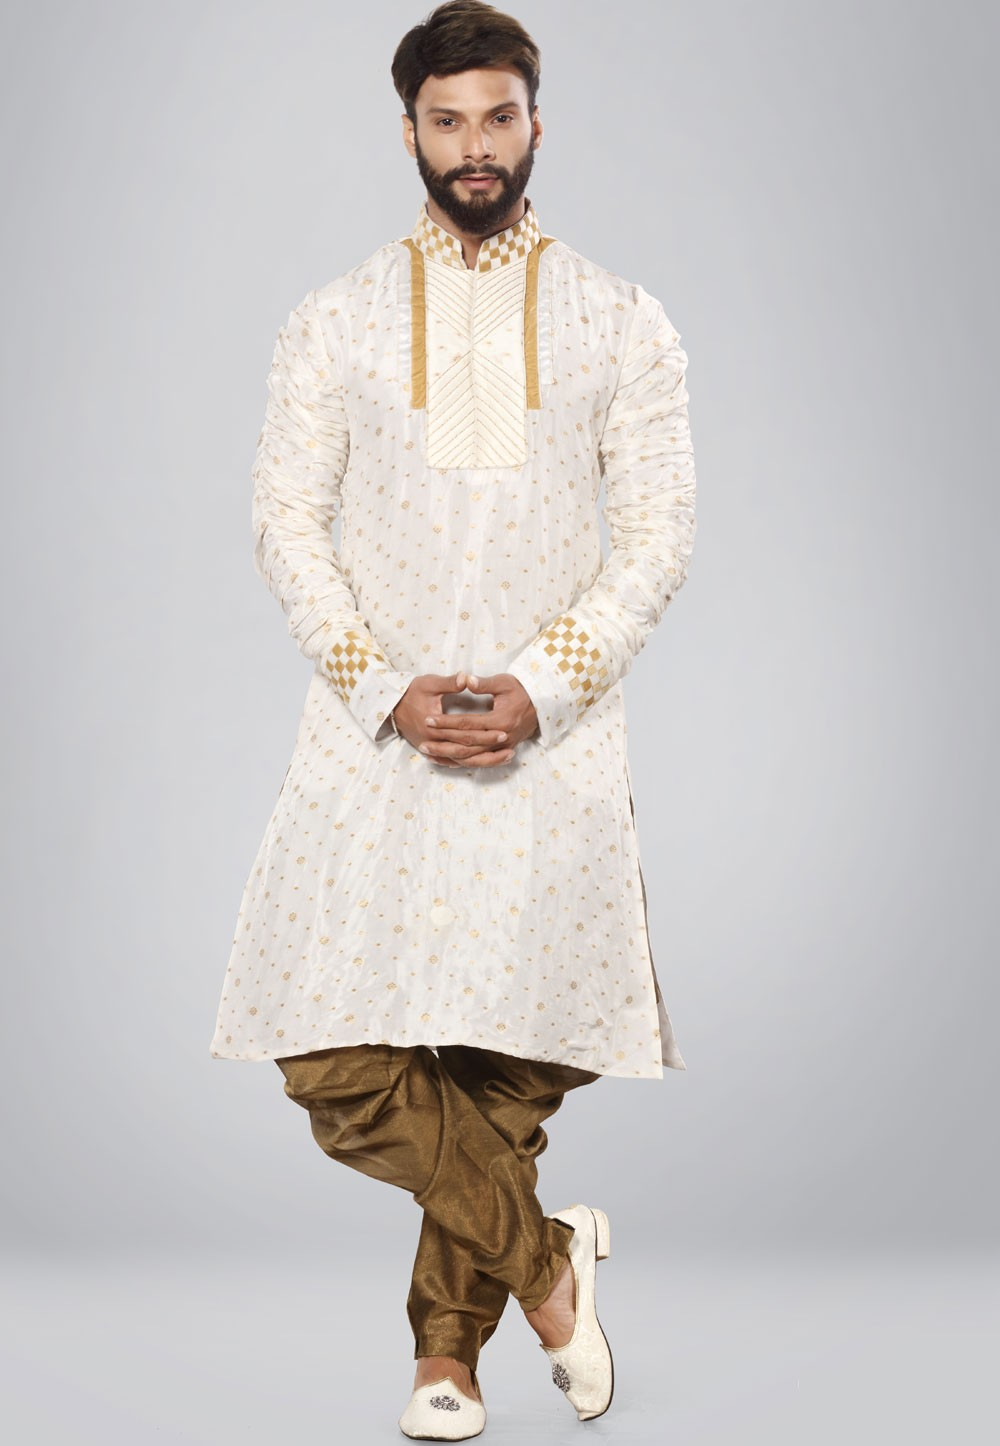 Exquisite Men's White,Golden Color Readymade Kurta Set